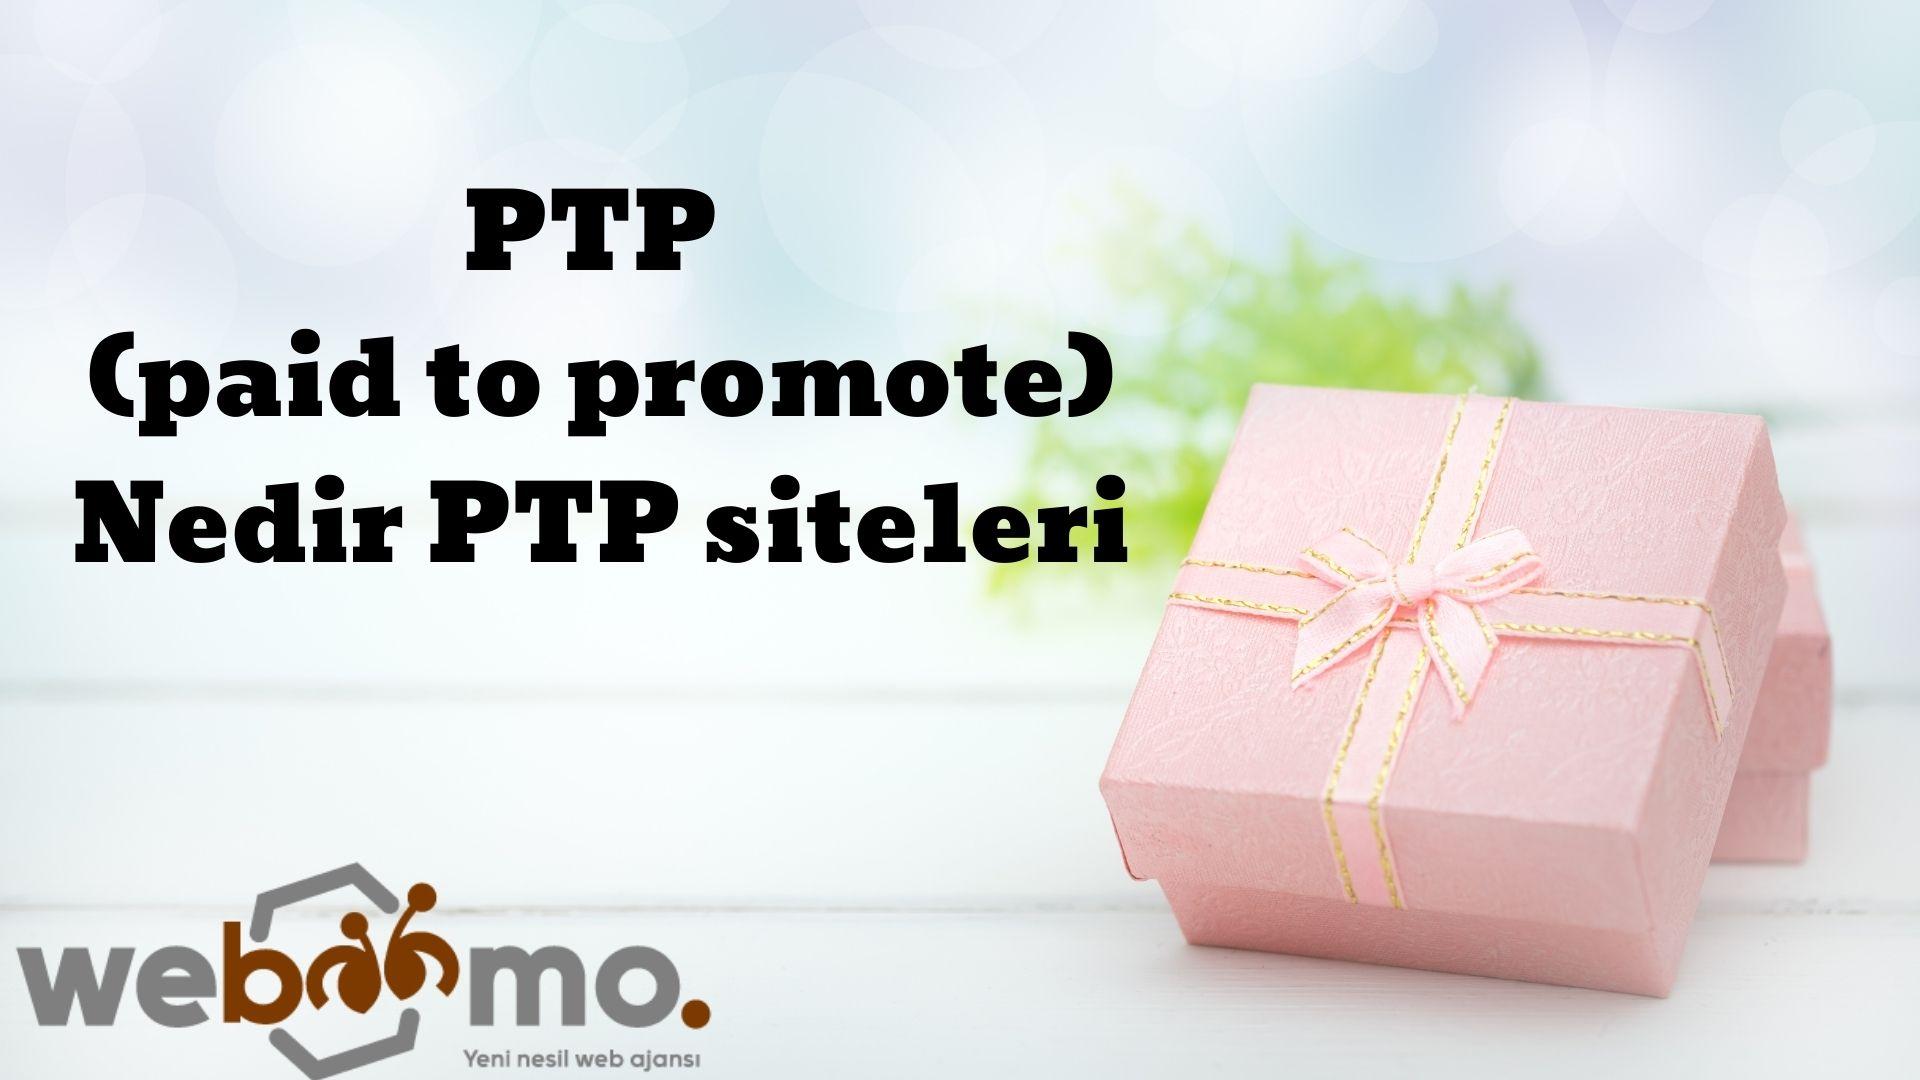 PTP (paid to promote) Nedir PTP siteleri